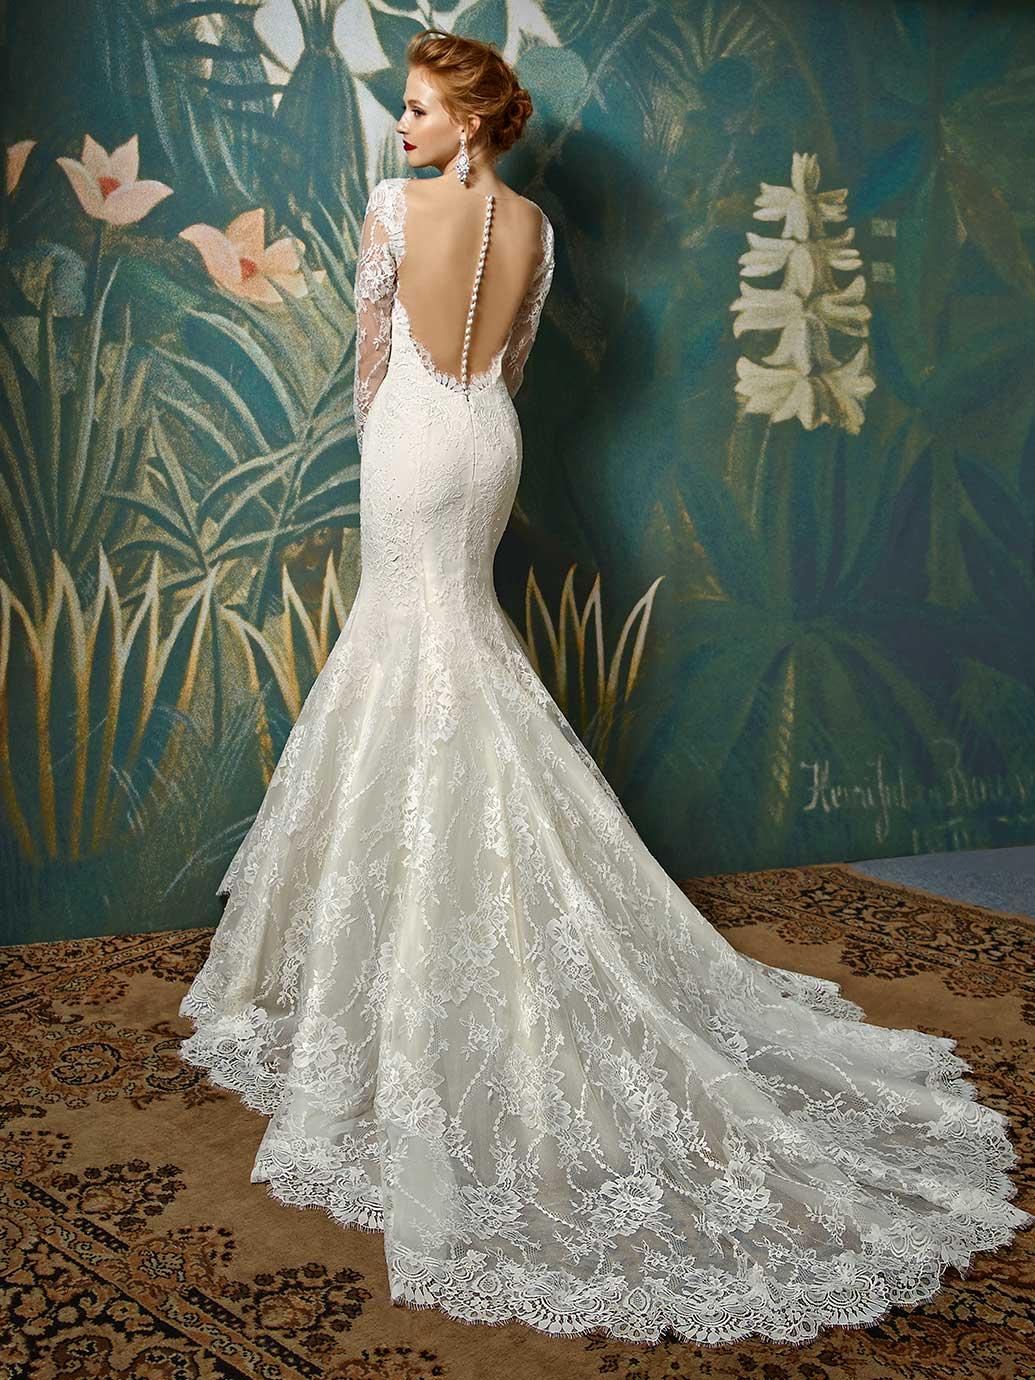 33c6a91f2ba Wedding Dresses   Bridal Gowns